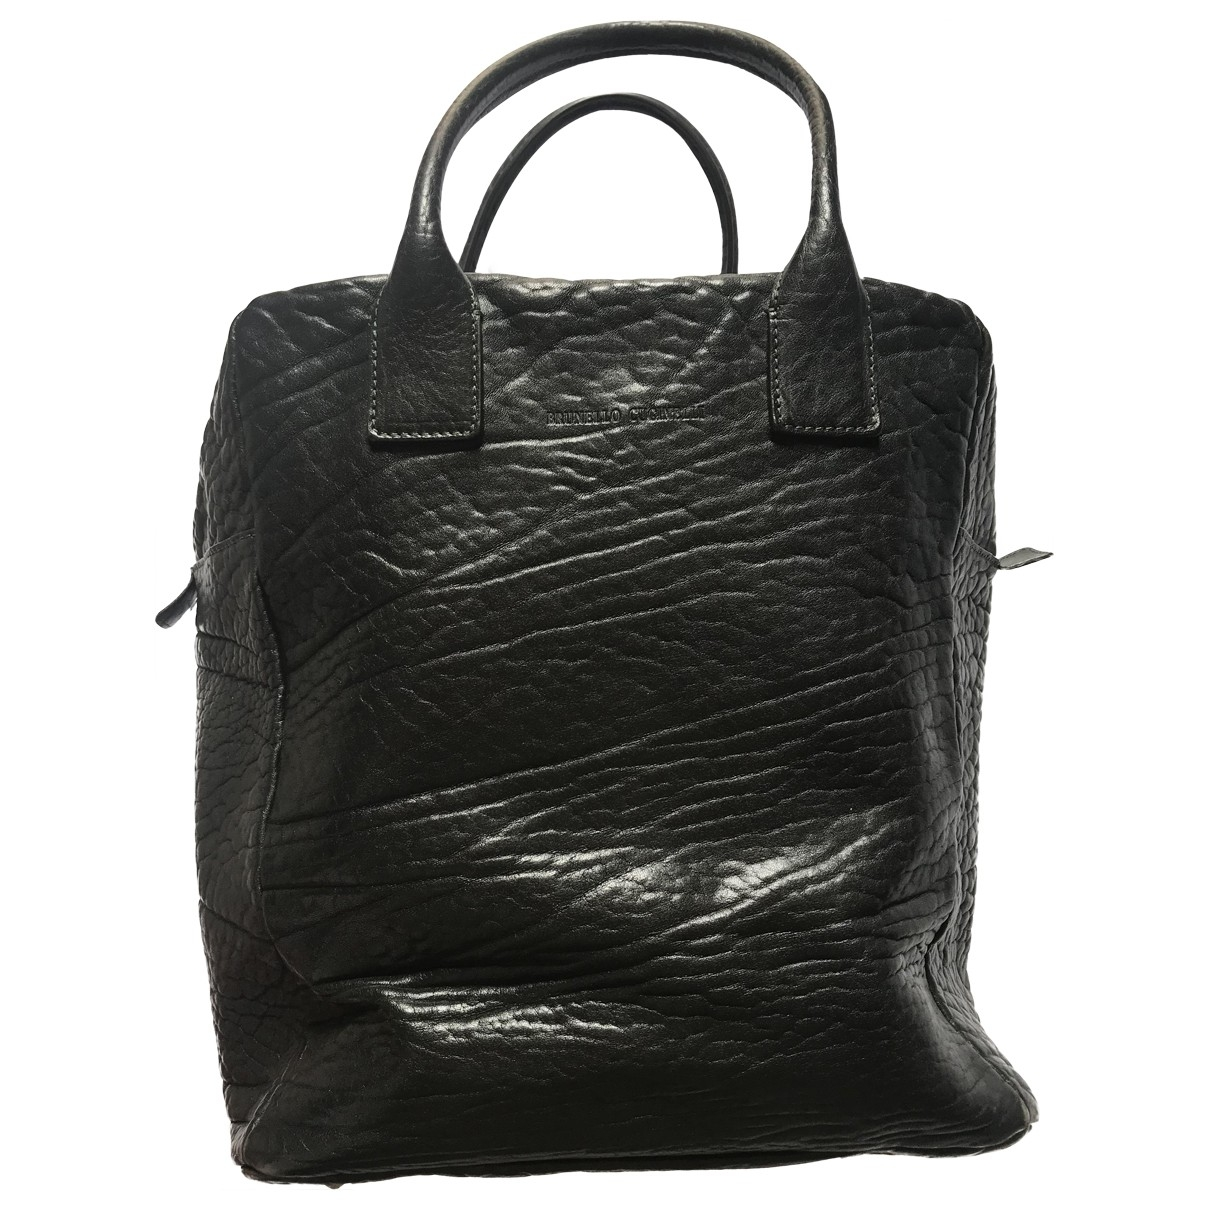 Brunello Cucinelli \N Green Leather handbag for Women \N